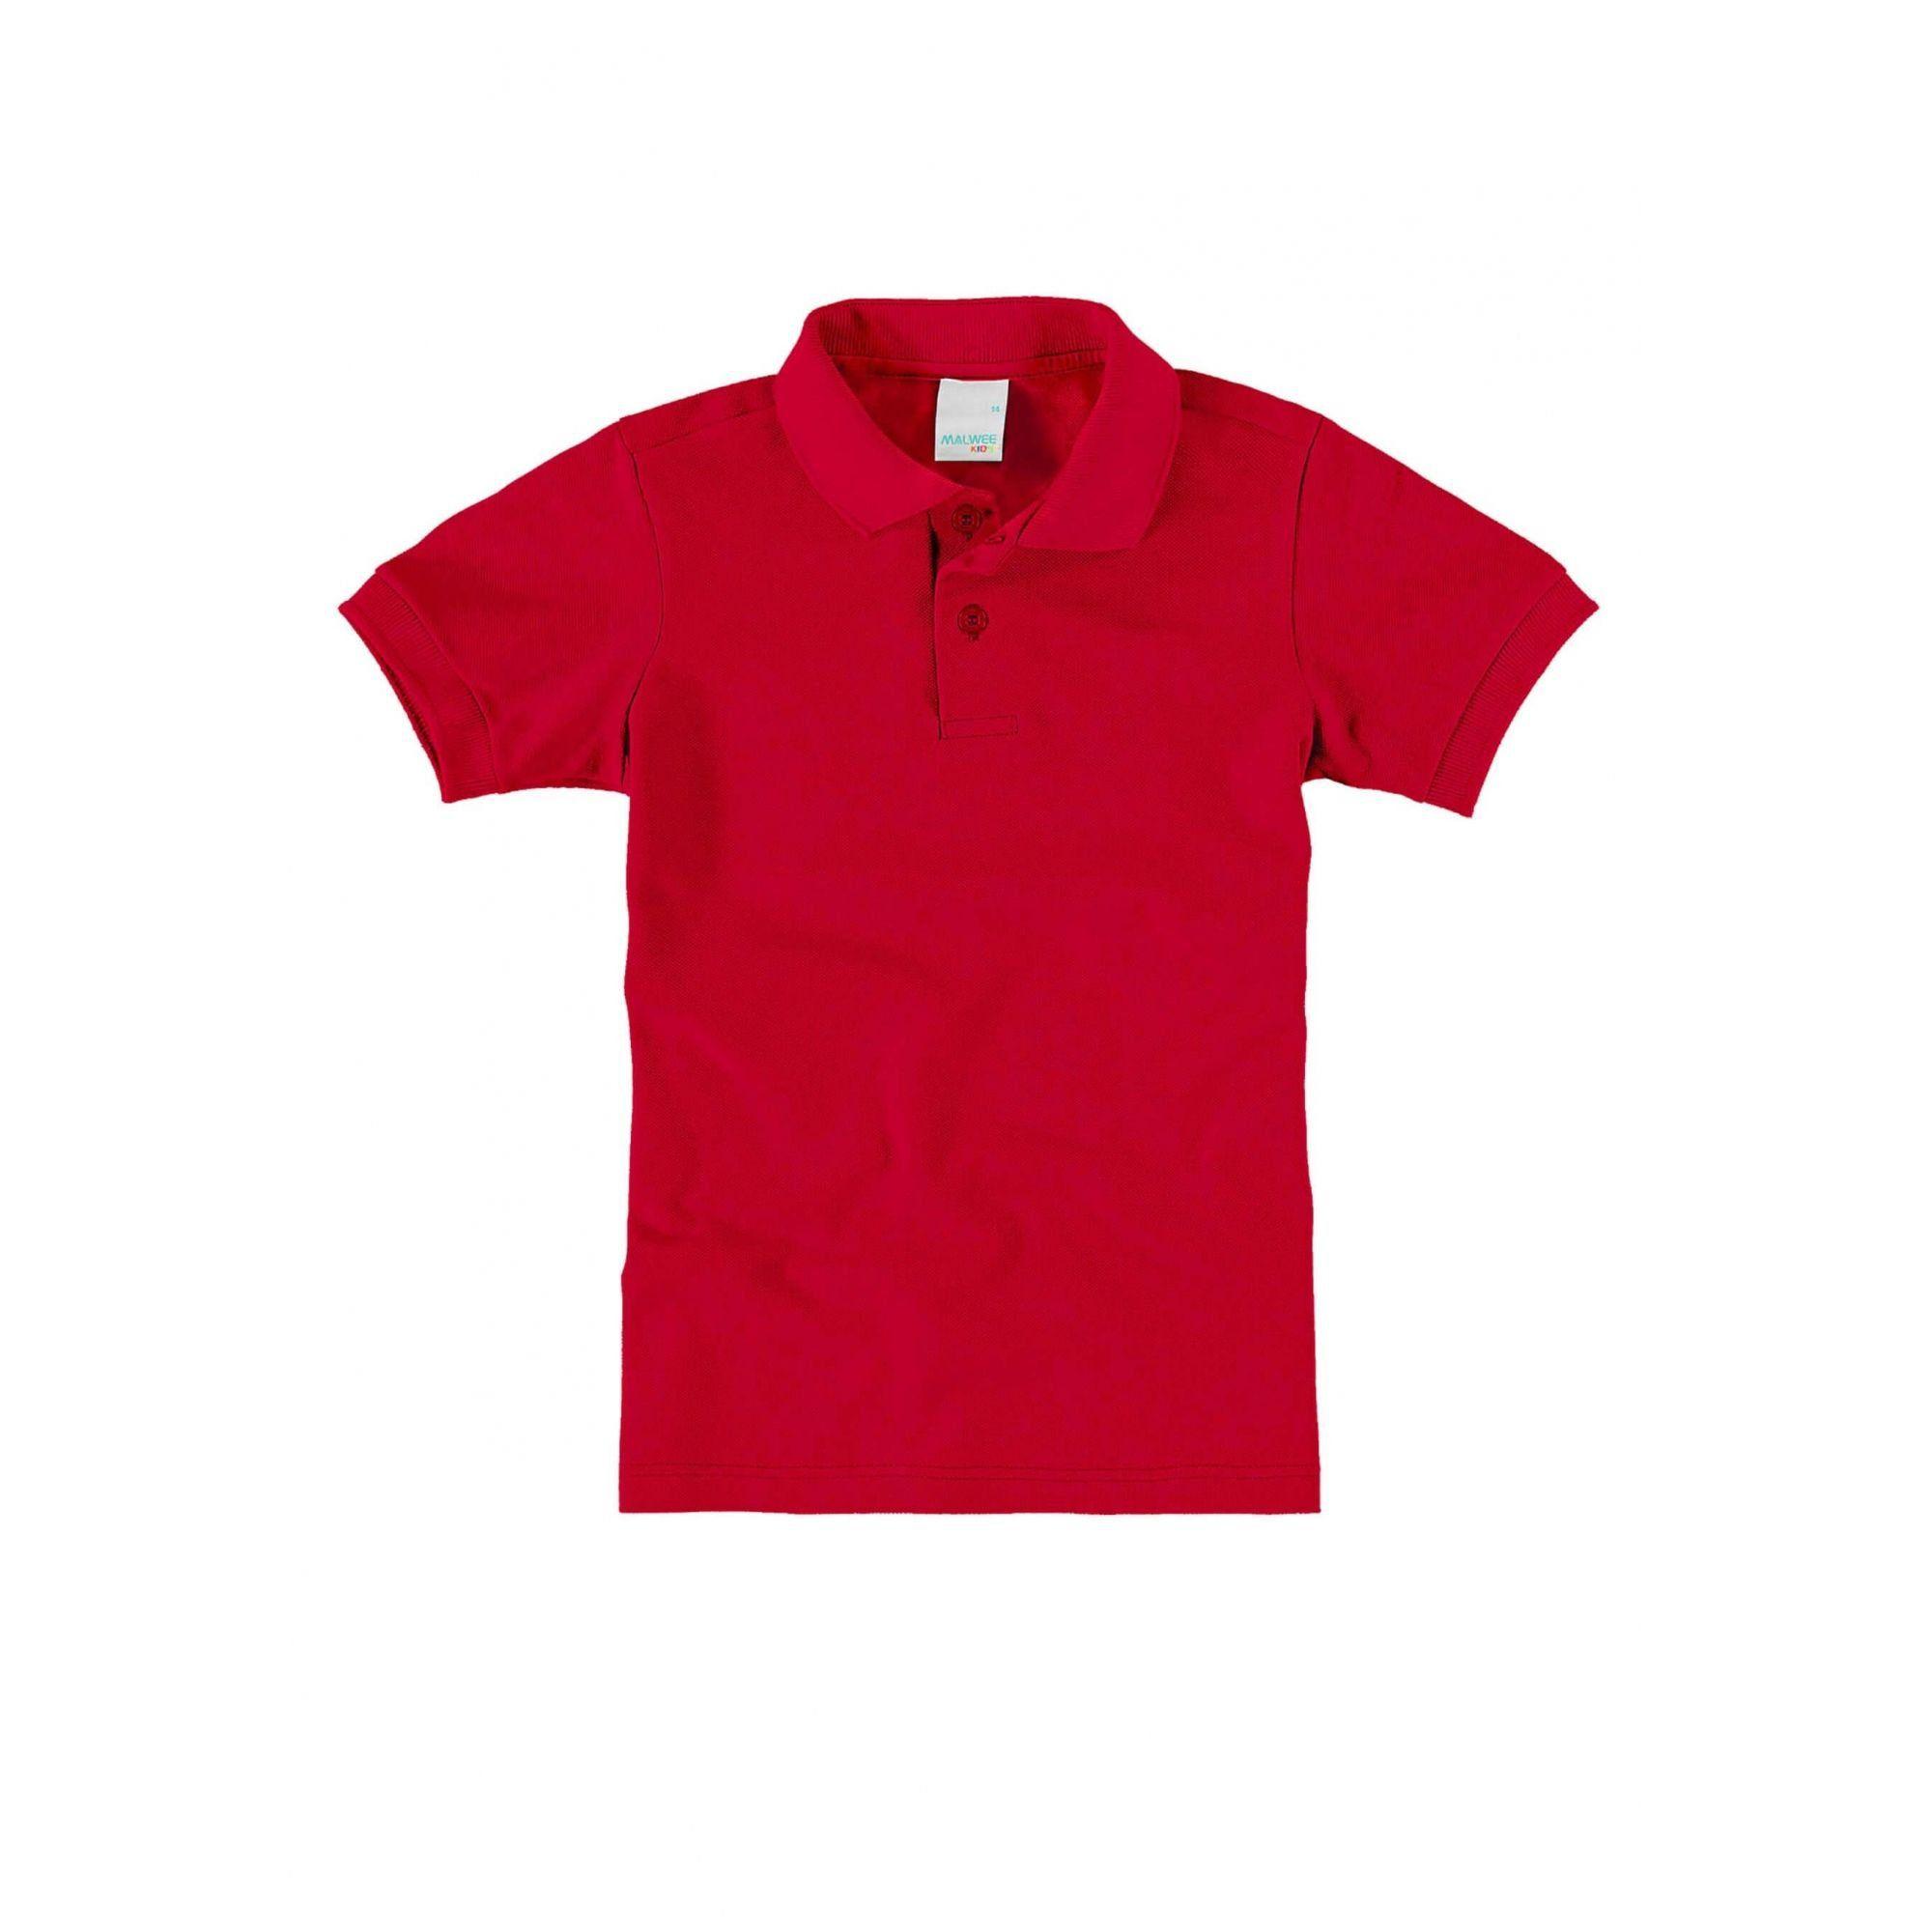 Polo Infantil Vermelha Masculina Malwee